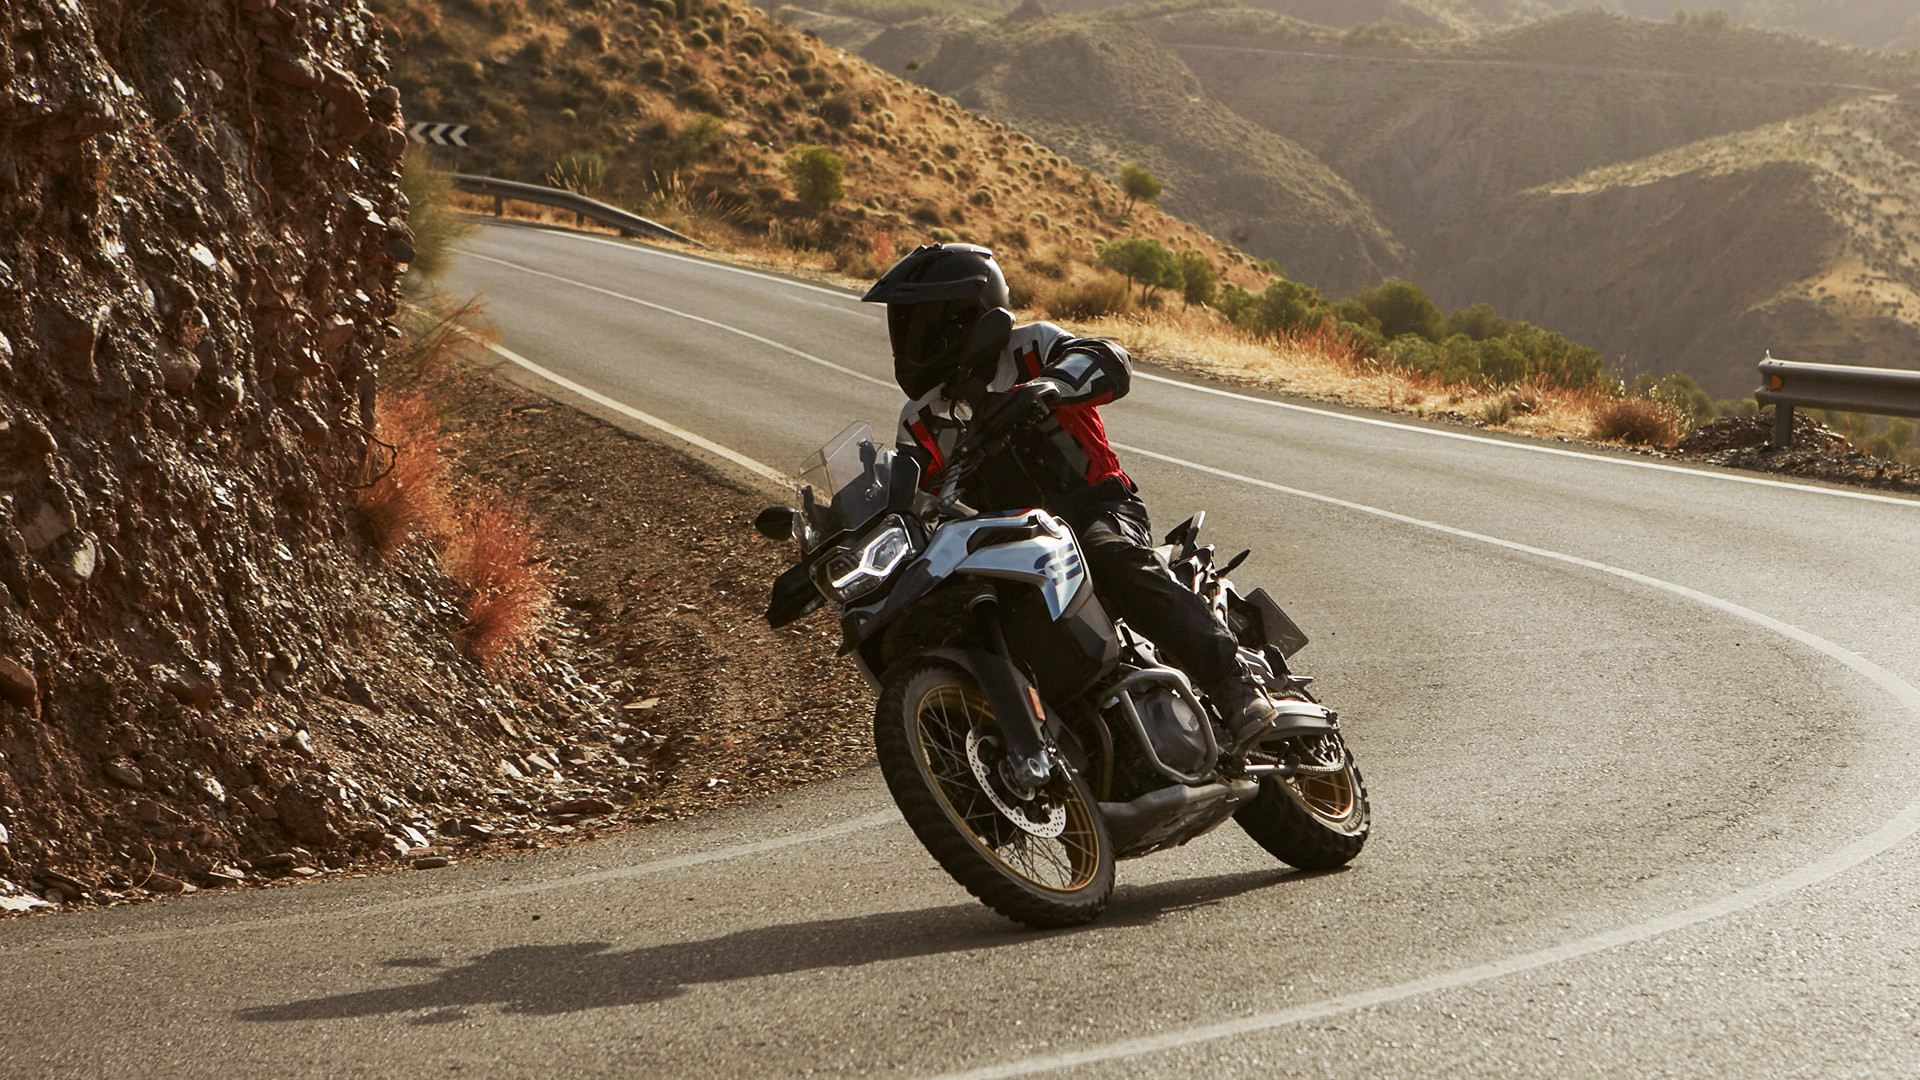 BMW Motorcycles Of San Francisco